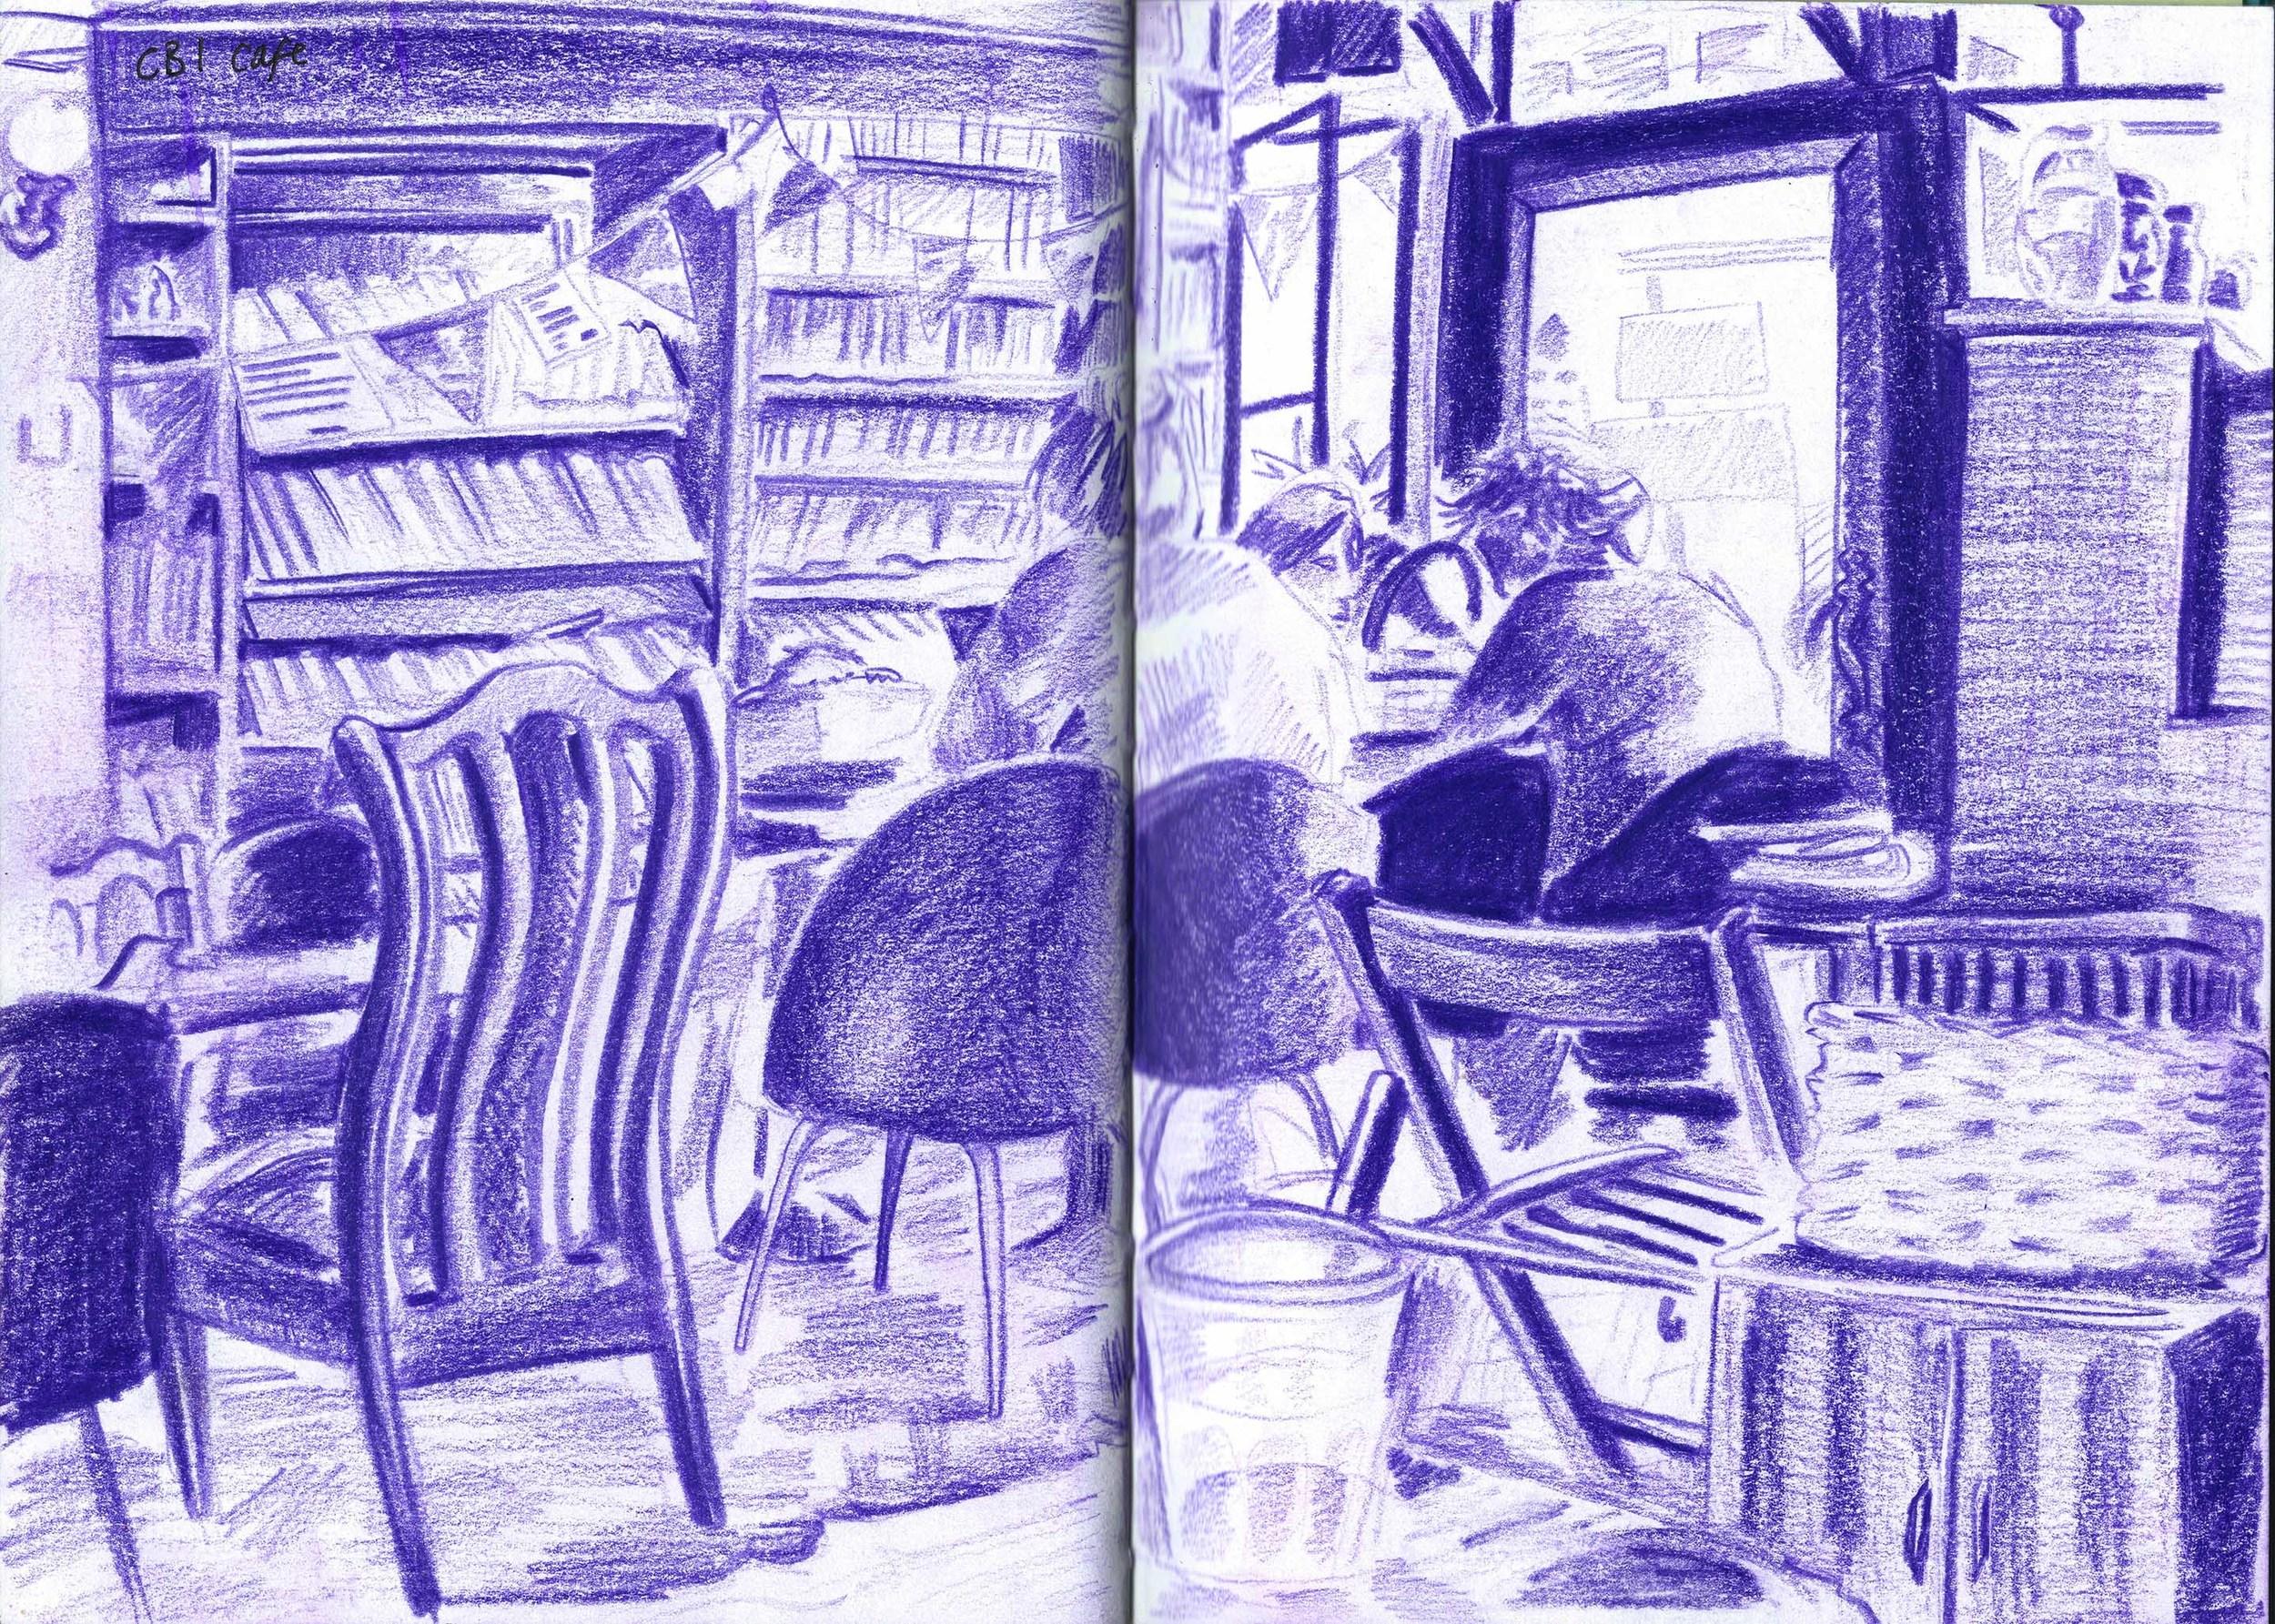 CB1 Cafe tonal drawing